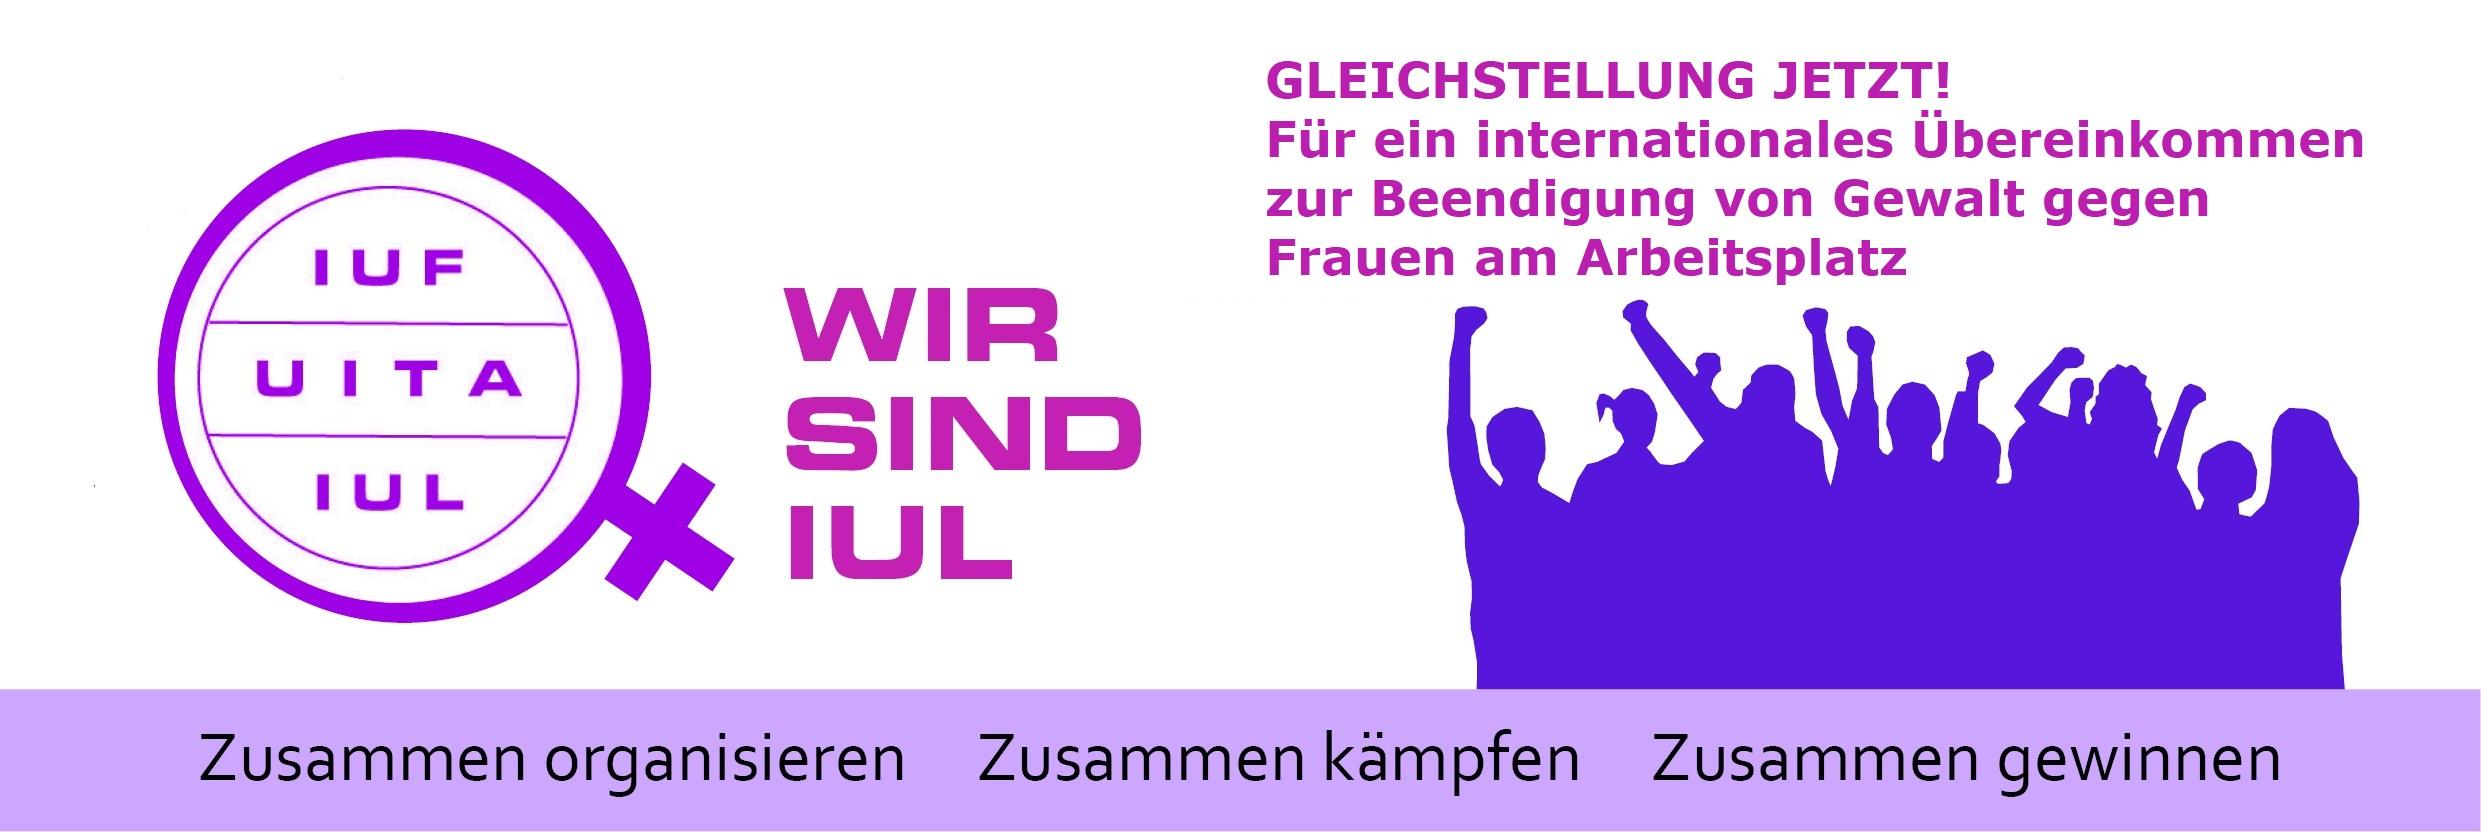 IUF_8March_German_NA_2_0